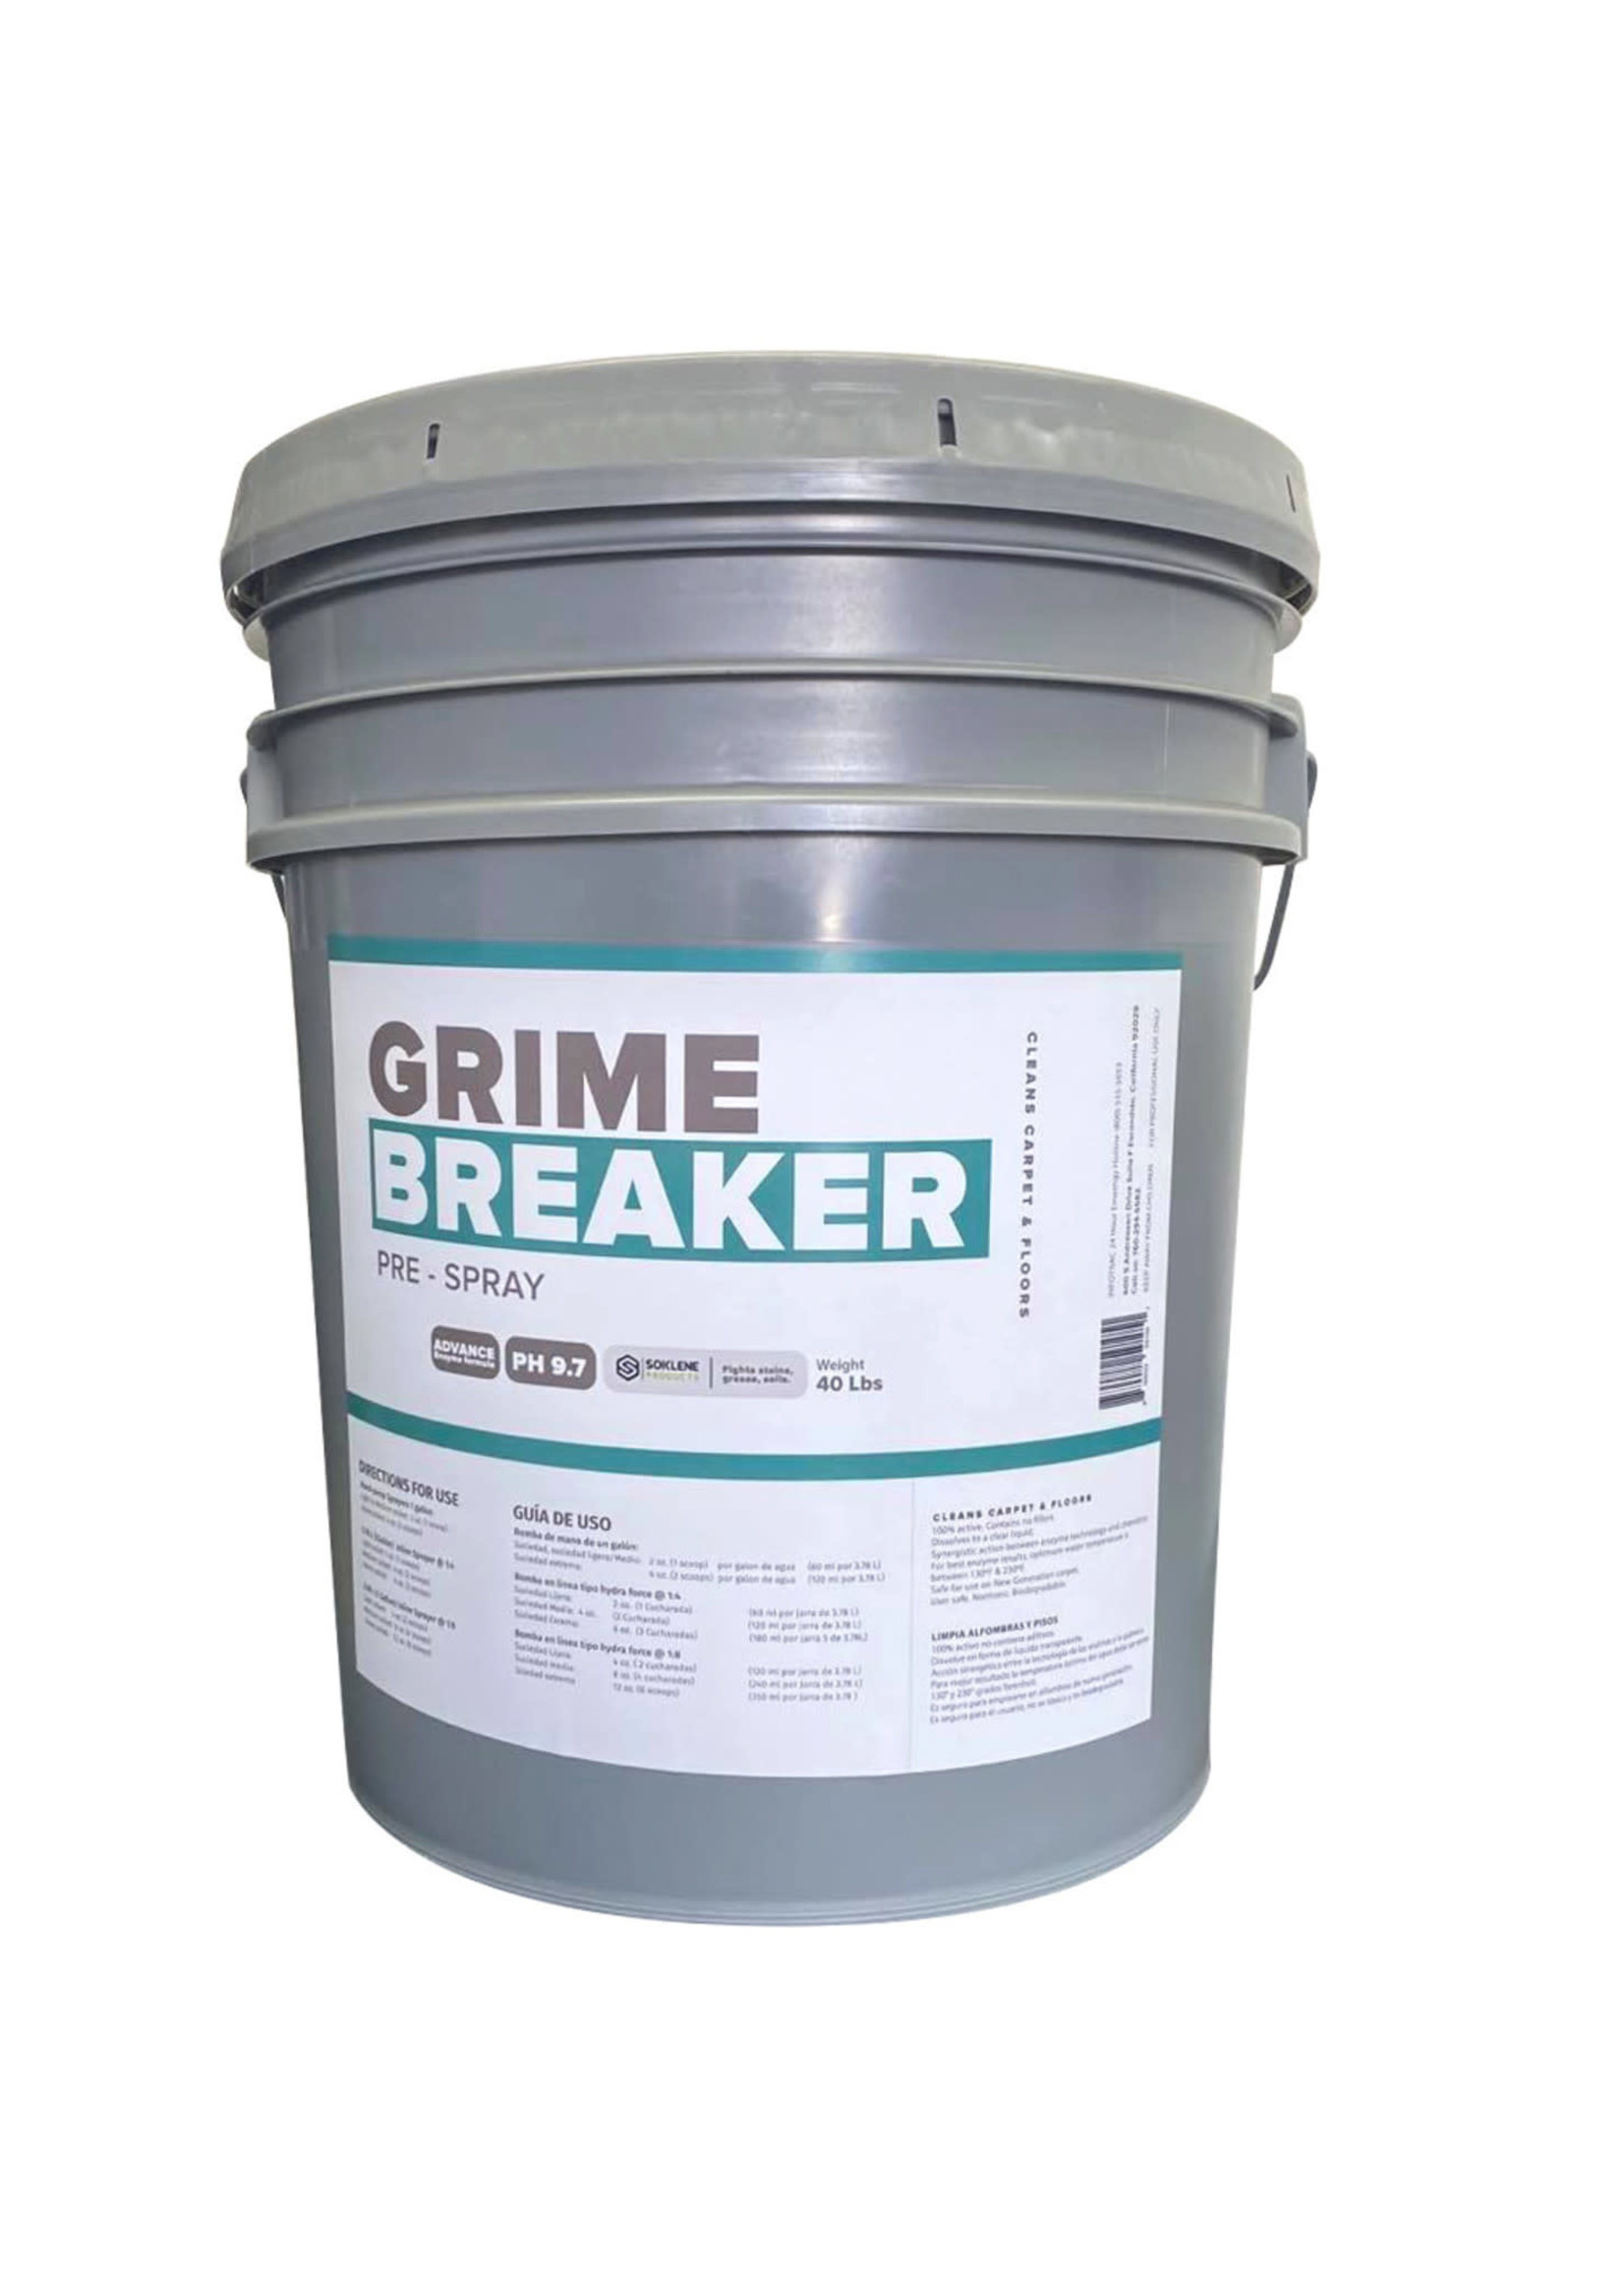 Grime Breaker